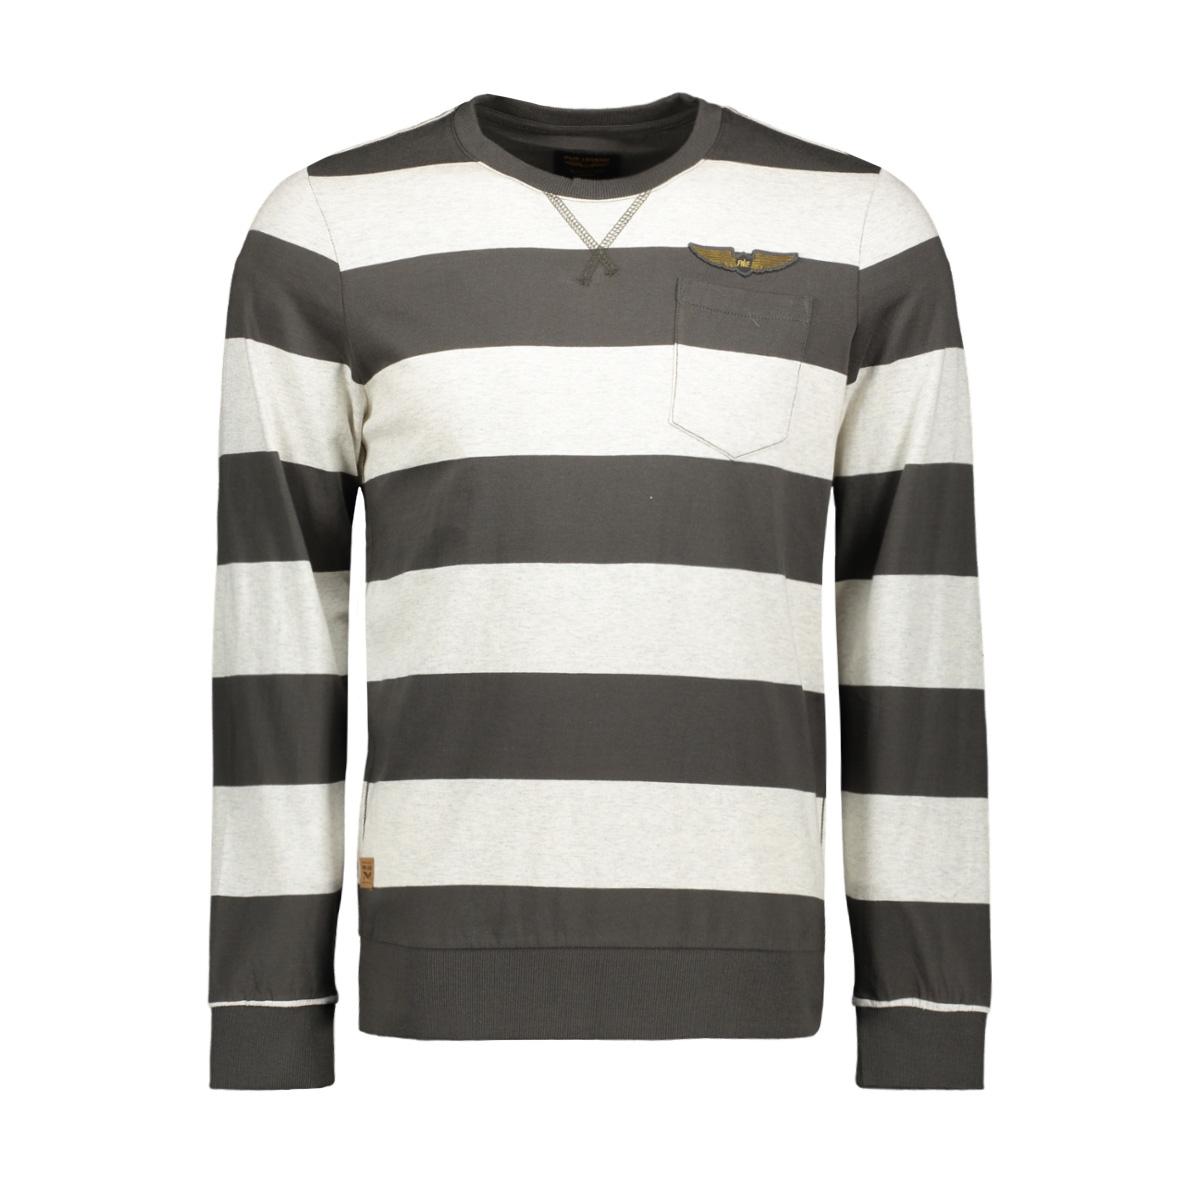 striped jersey pts198530 pme legend t-shirt 8039